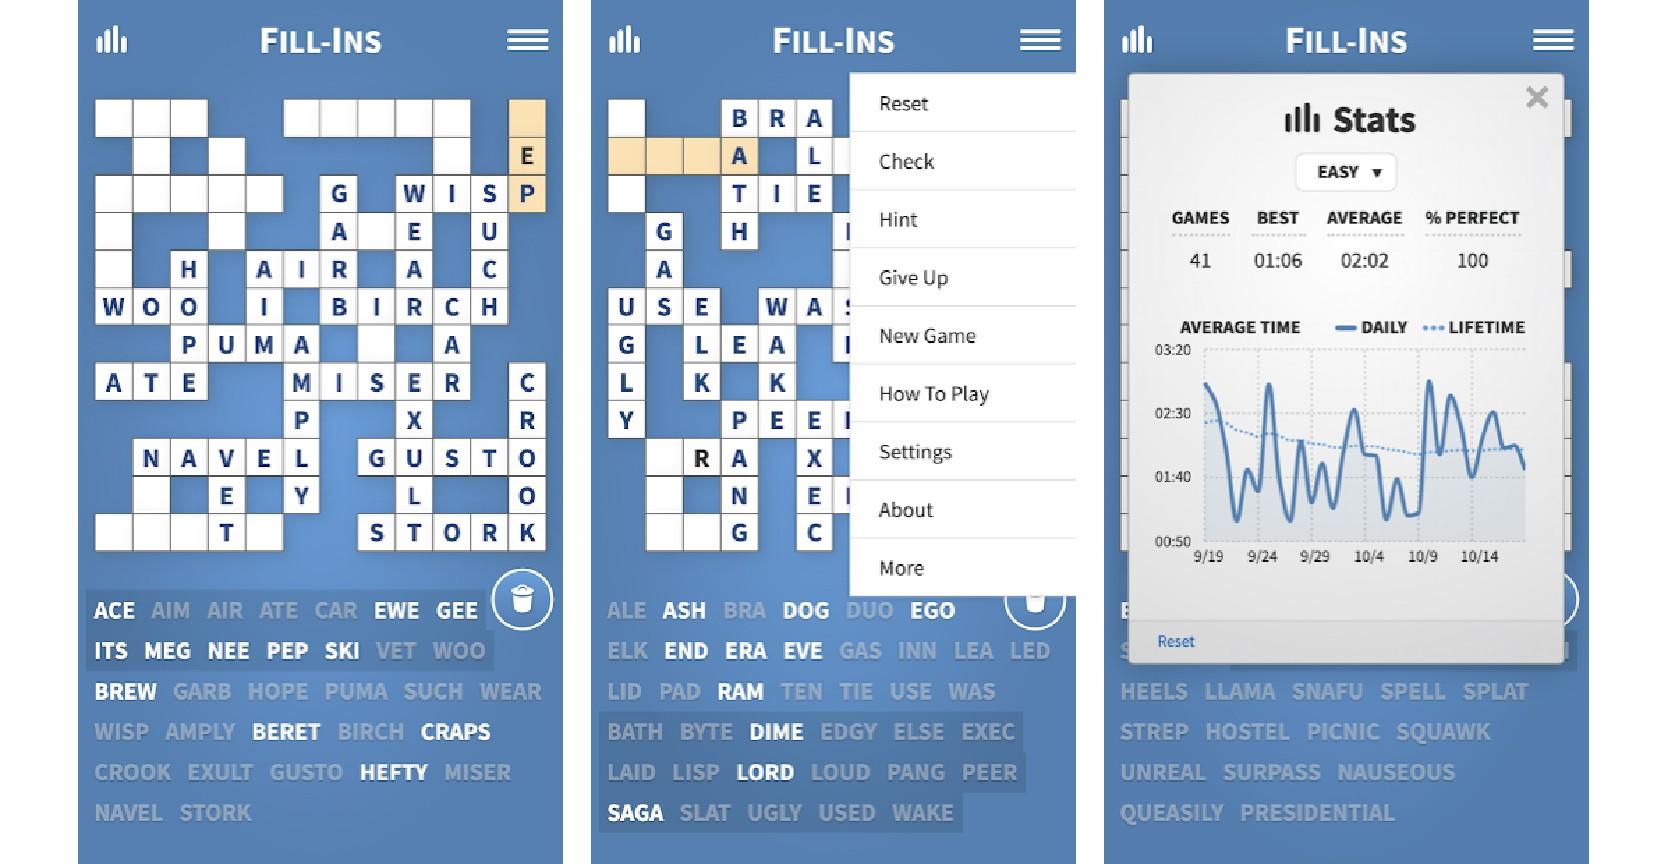 Fill-Ins mobile app screenshots